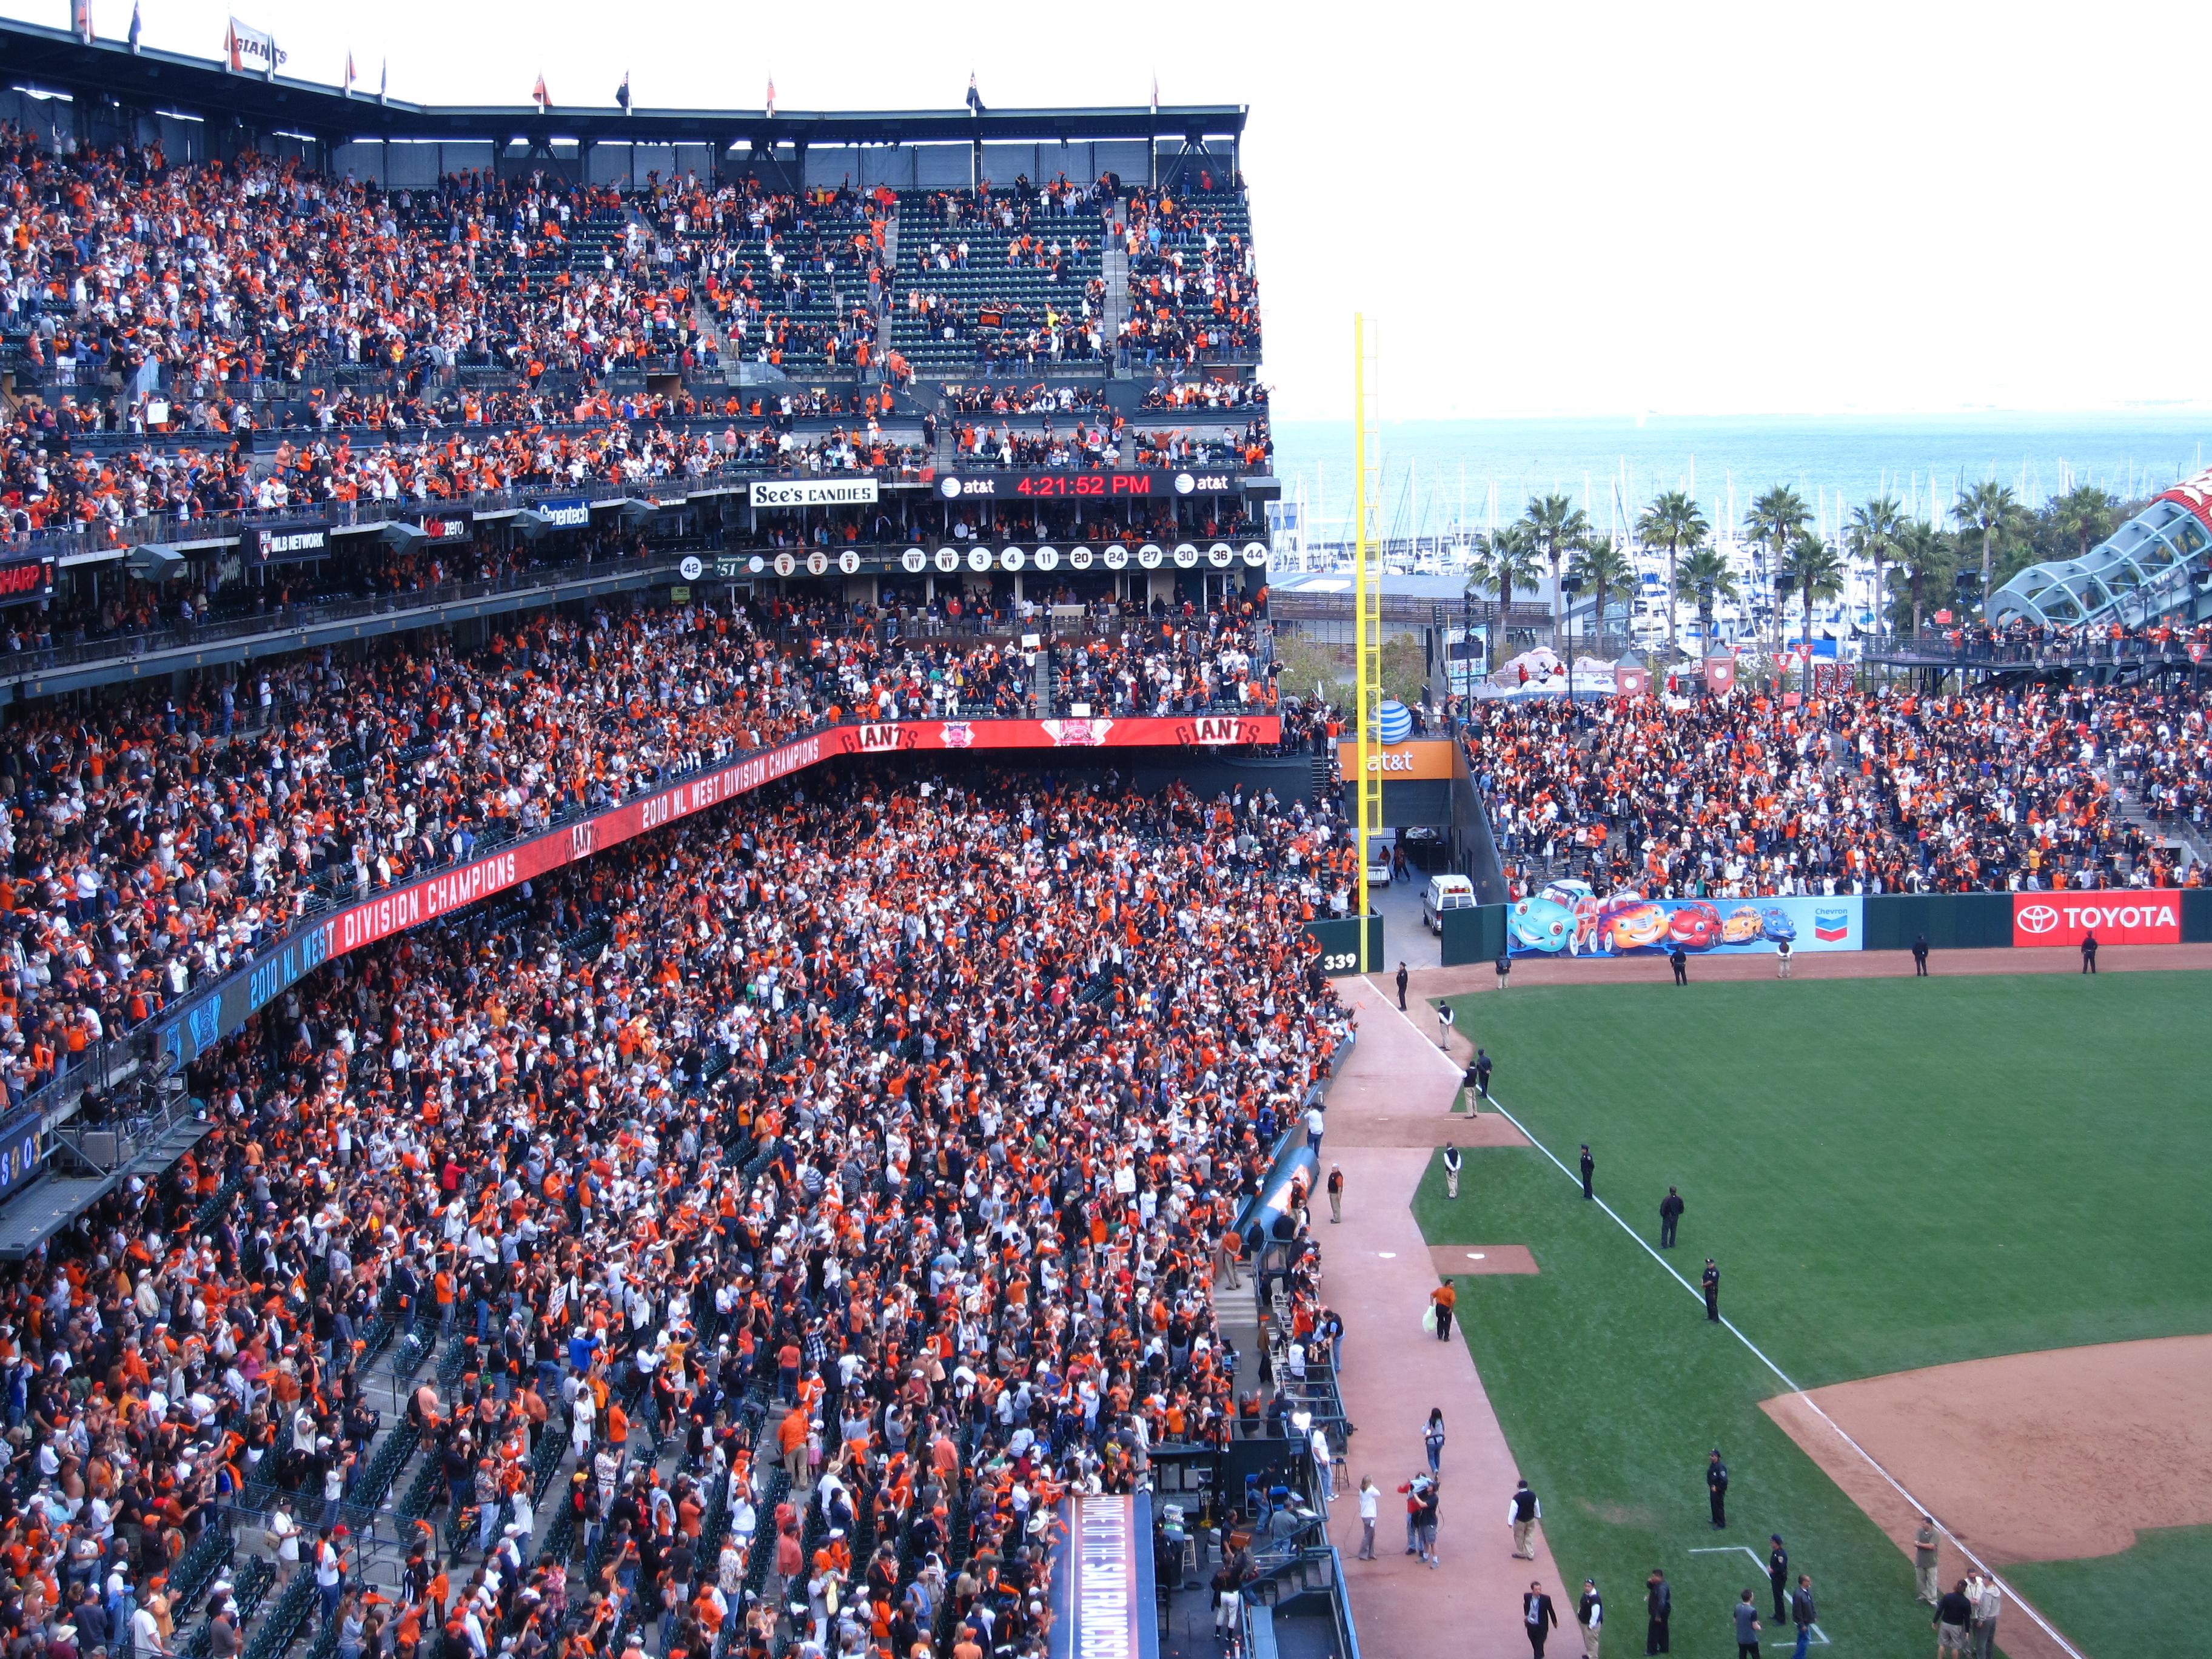 Baseball Fans Cheering Giants fans cheer their team!